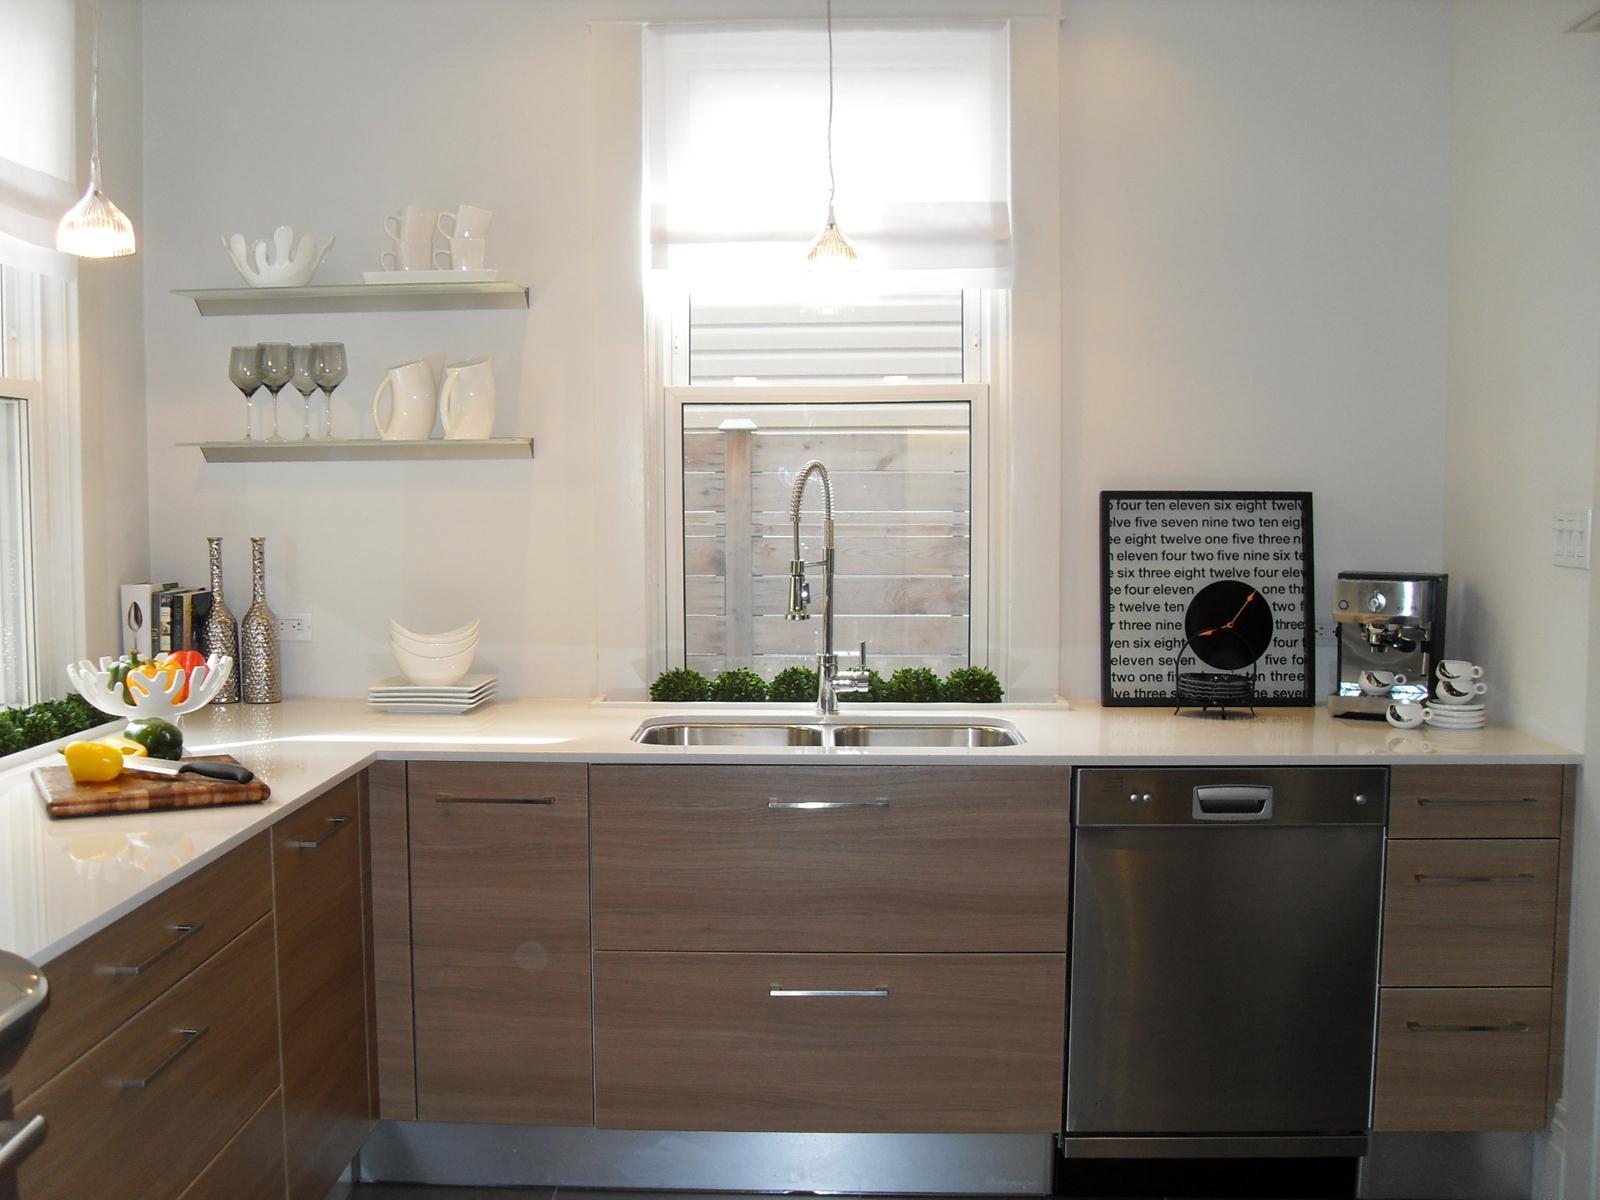 Kitchen 24 Pic 1.jpg